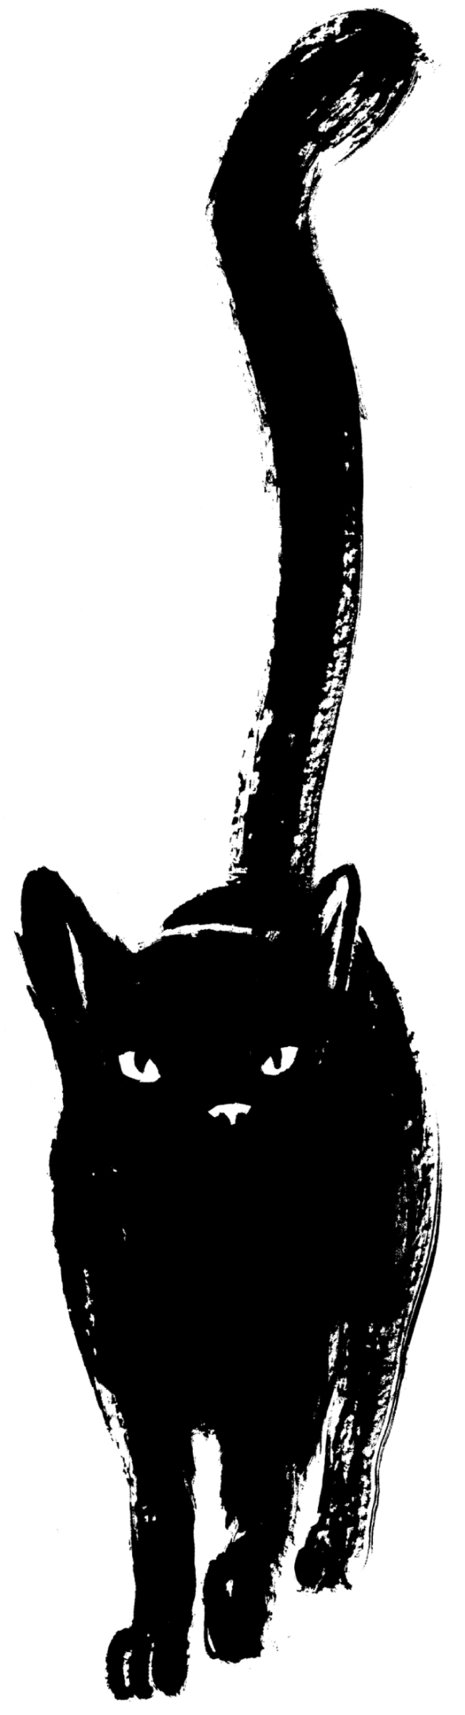 Cat Illustration Tumblr Finally the flesh refl...